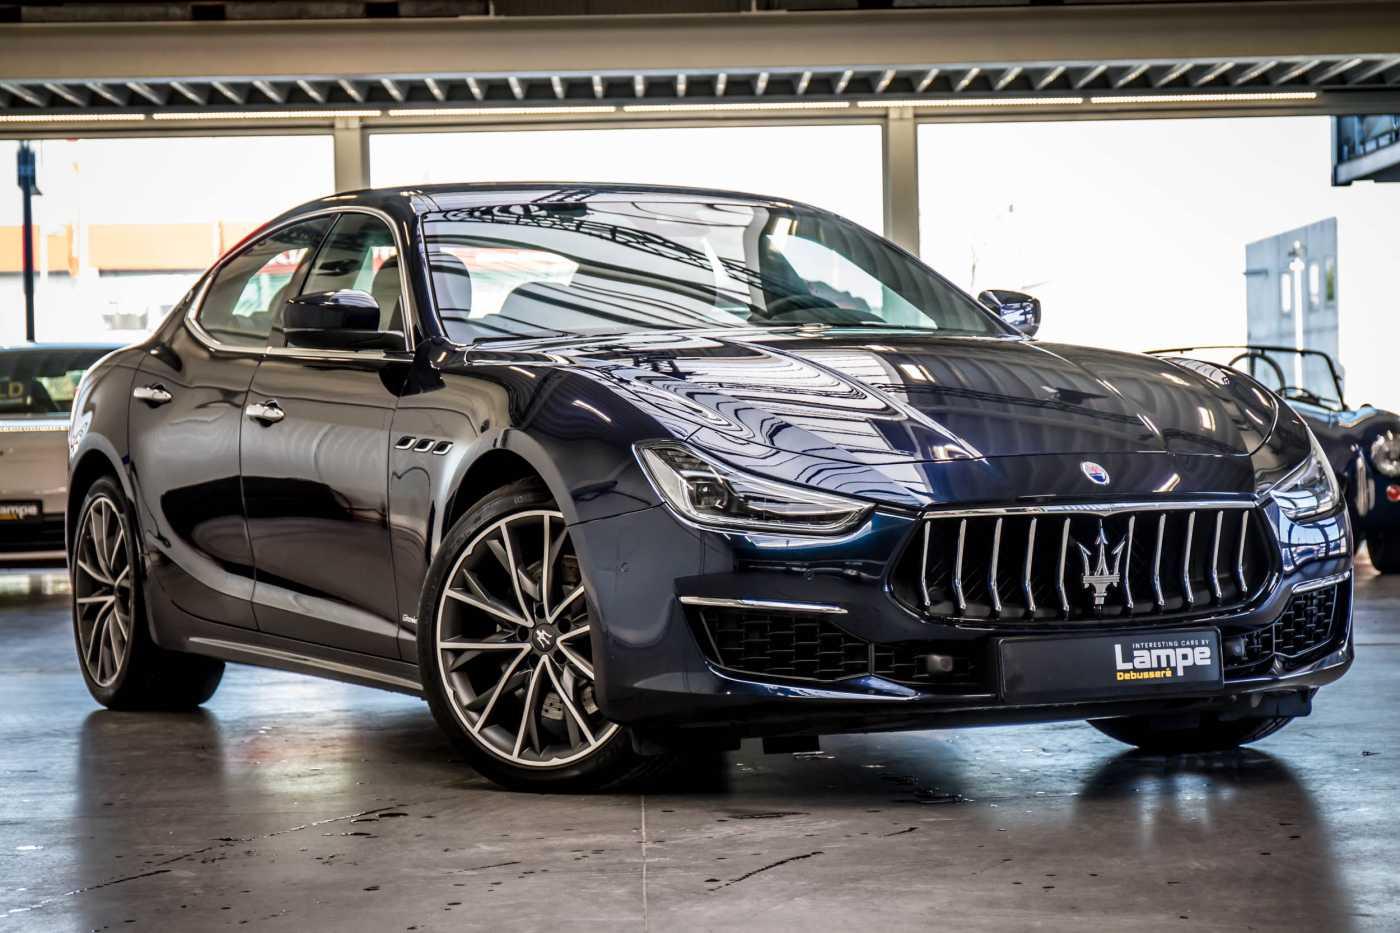 Maserati Ghibli Diesel GranLusso Keyless Sports Exhaust LED Camera 1/29